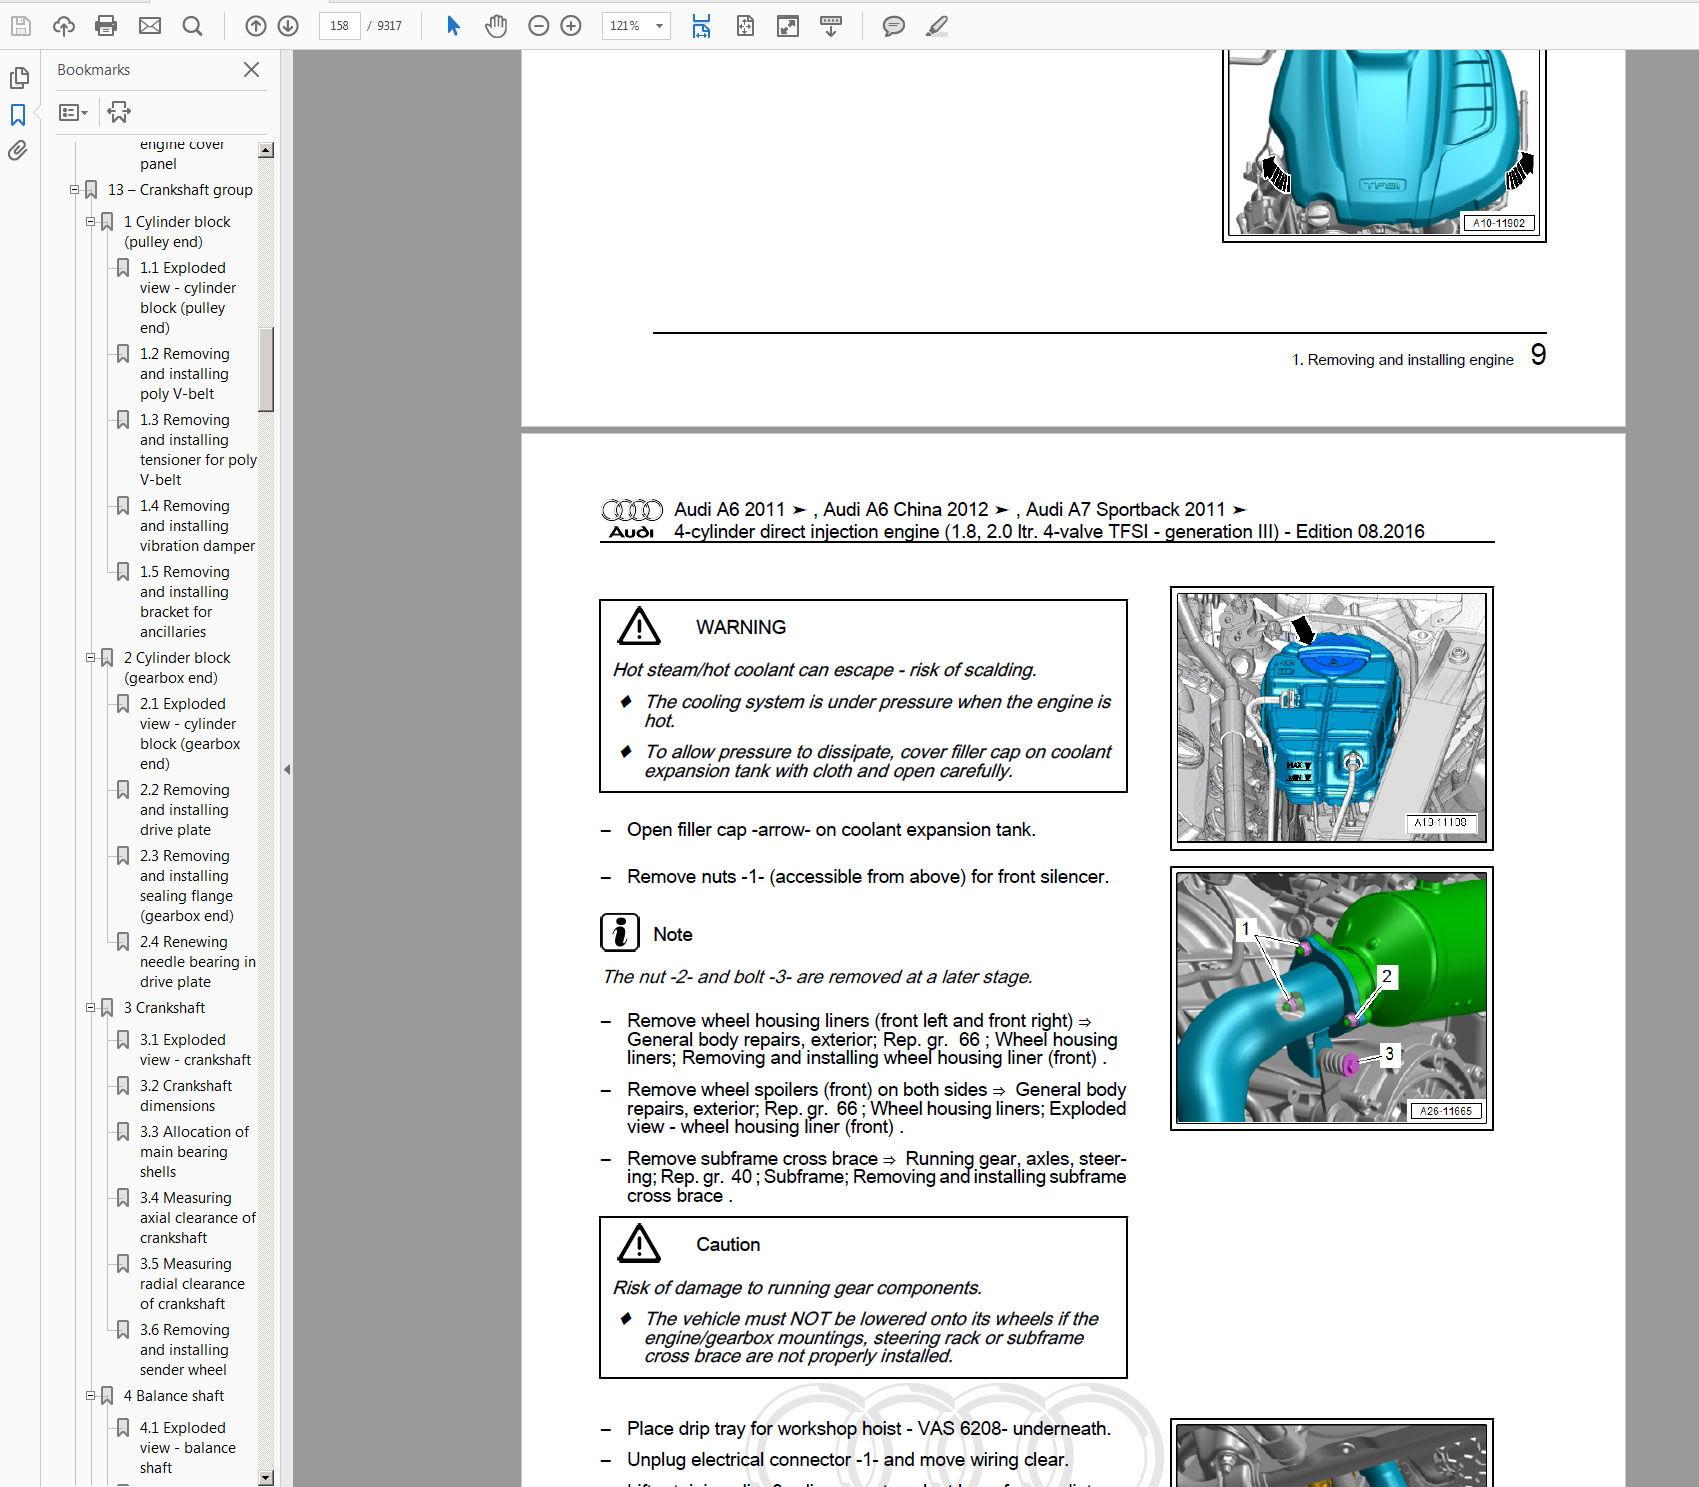 factory service manual audiworld forums rh audiworld com audi q5 repair manual free download audi q5 factory repair manual